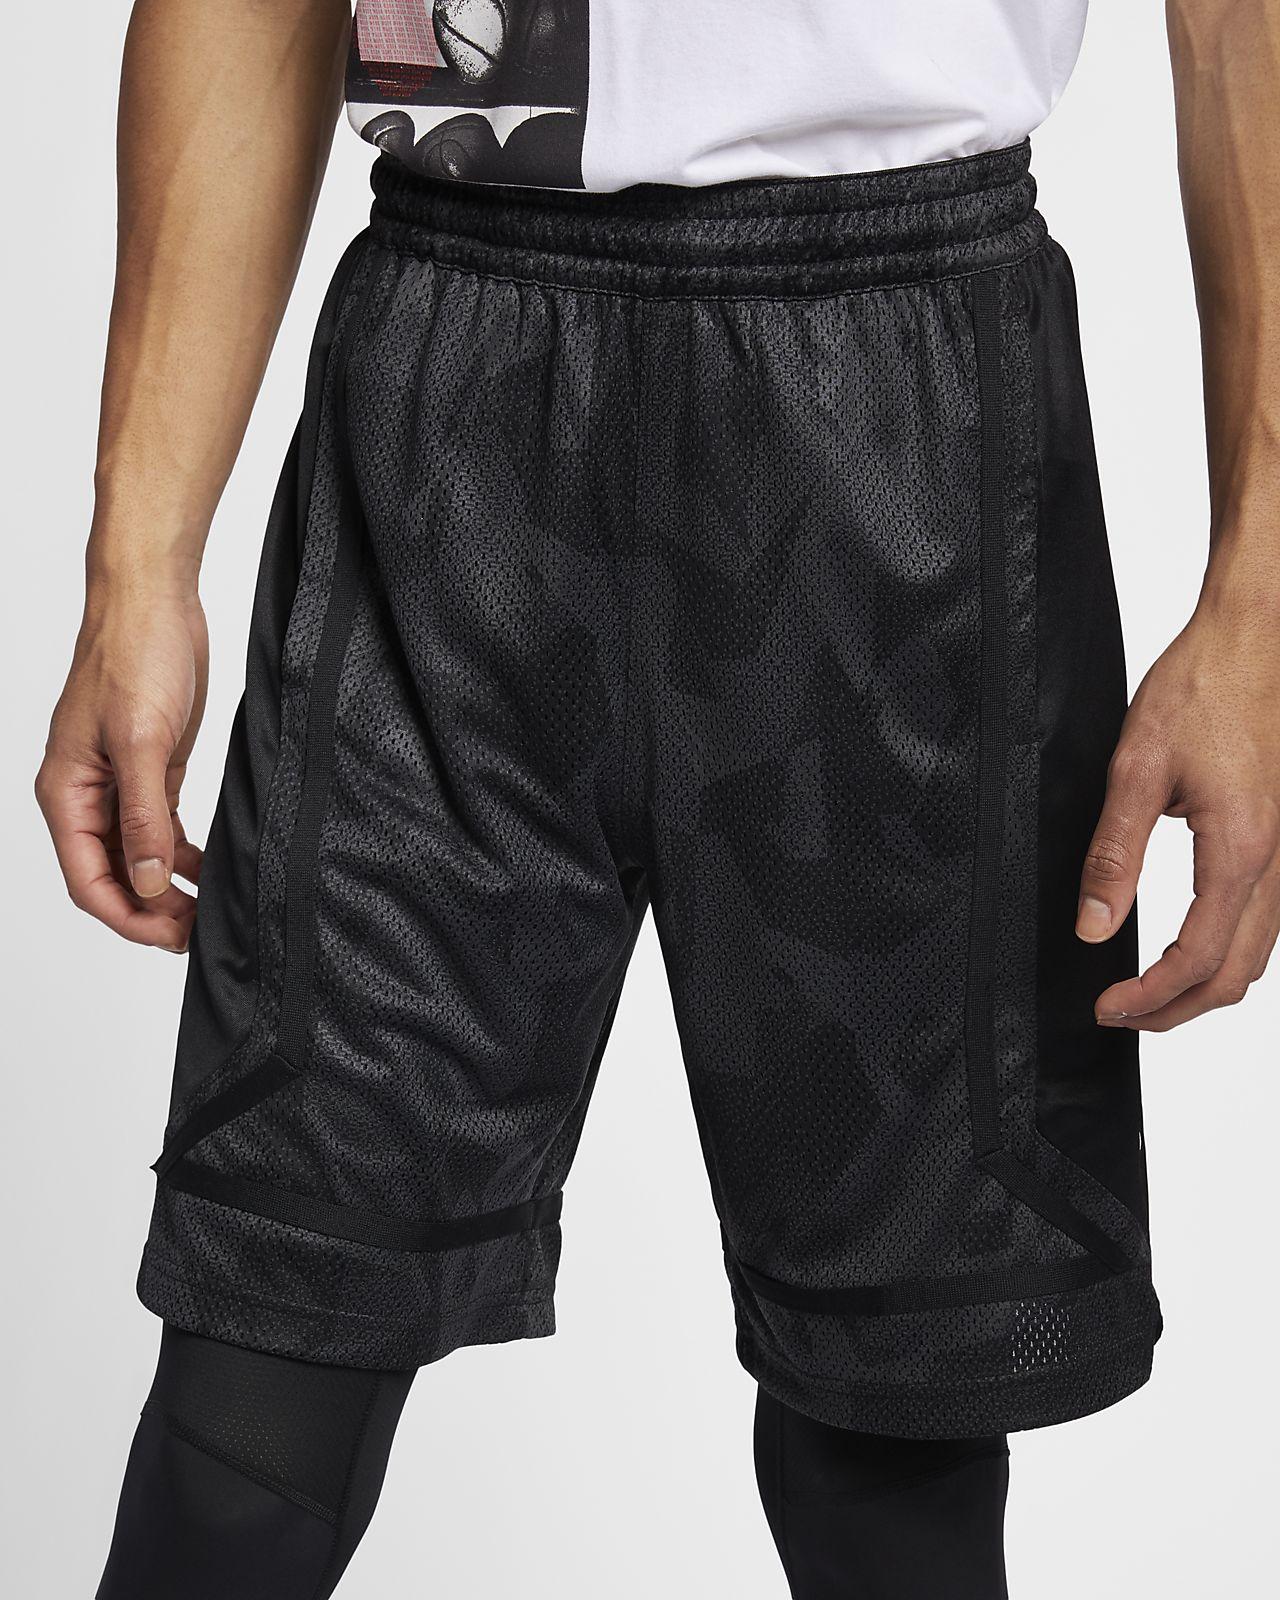 eaee5255c3728 Kyrie Dri-FIT Elite Men s Basketball Shorts. Nike.com